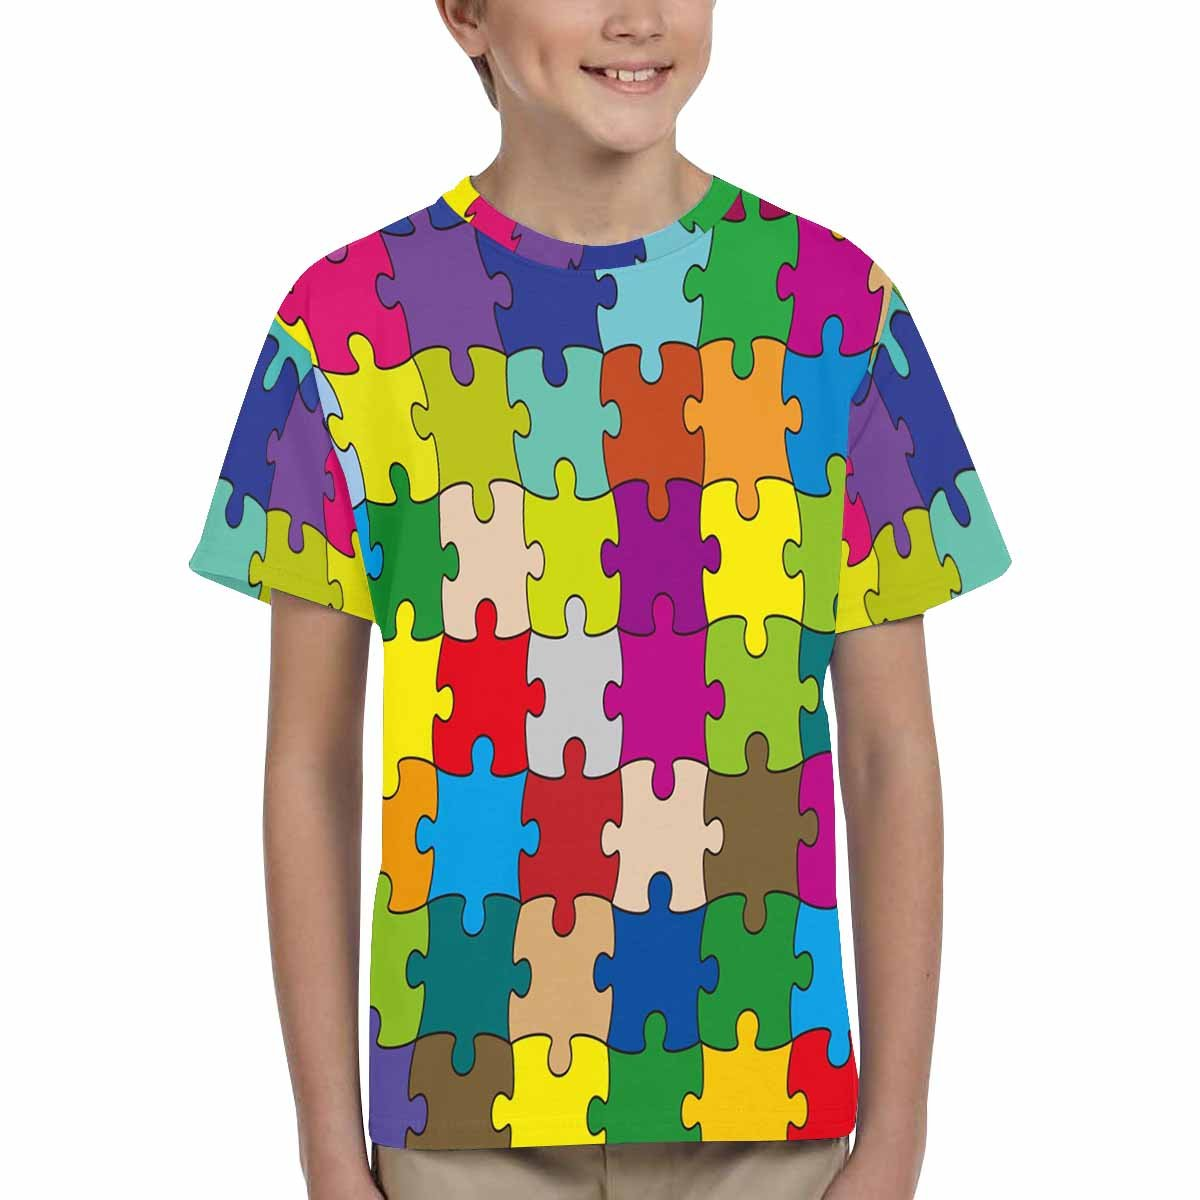 XS-XL INTERESTPRINT Kids T-Shirts 64 Pieces Puzzle